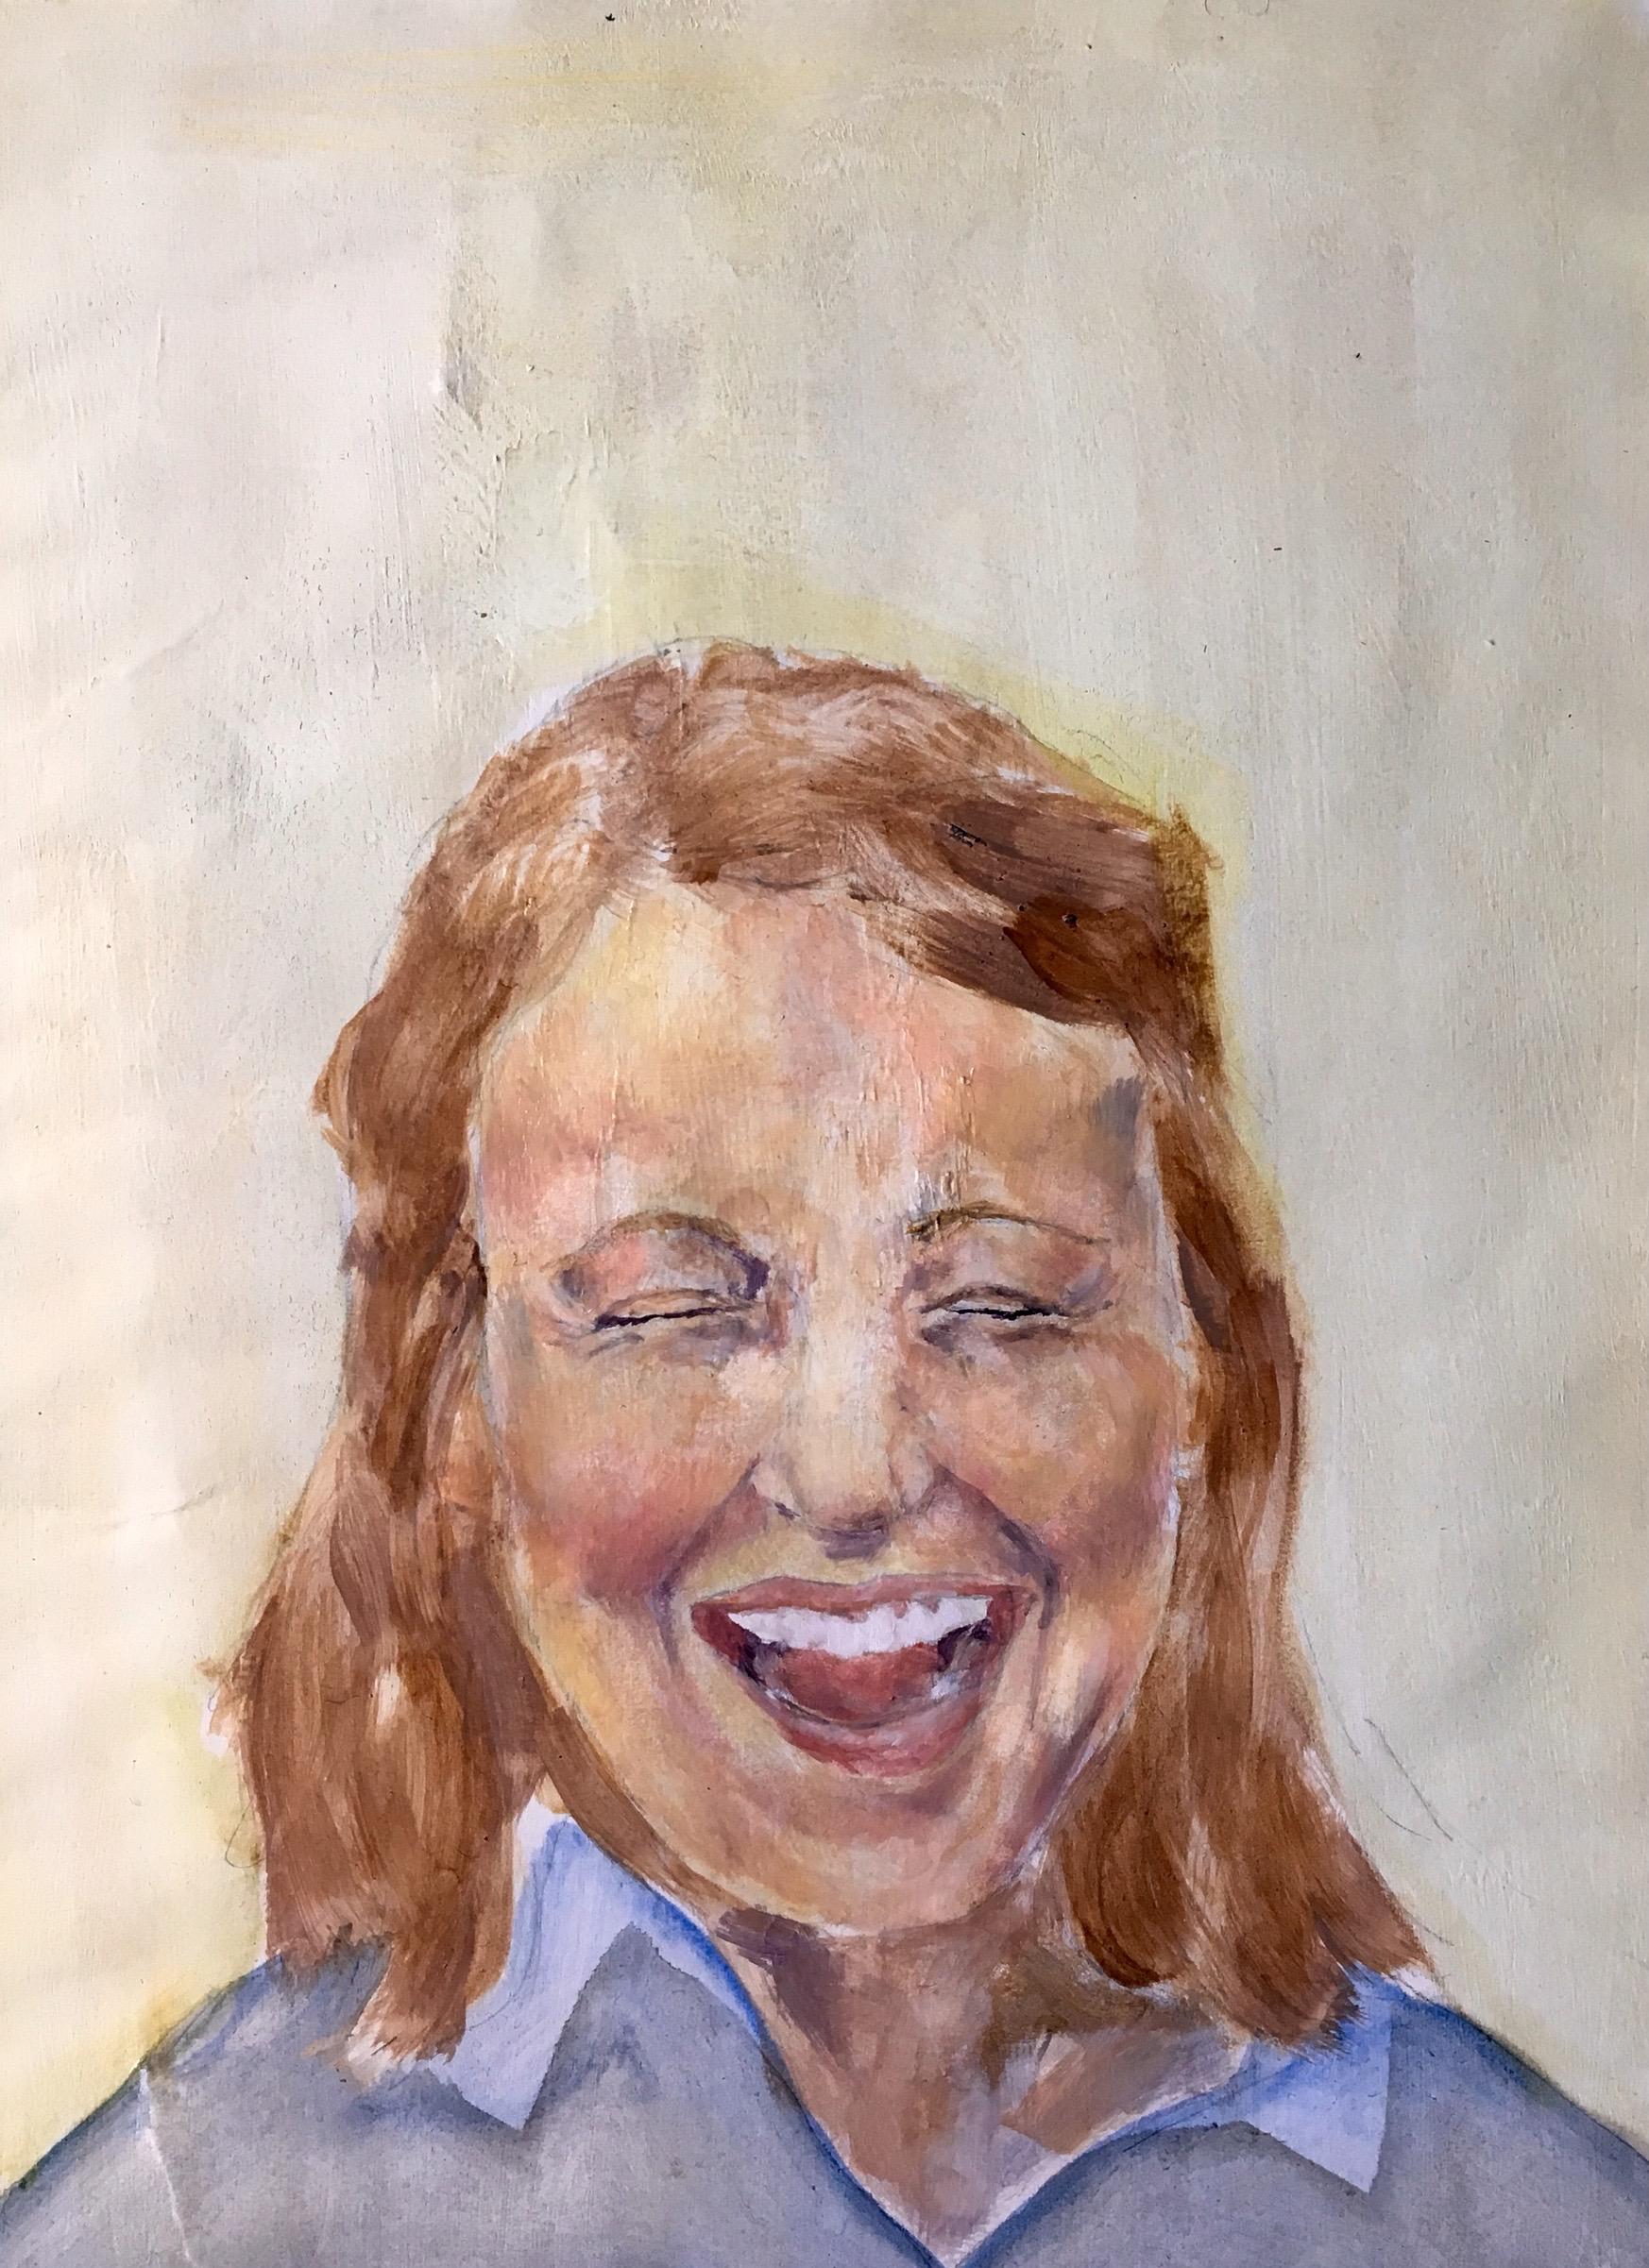 Sara Bess,Oil on Paper, 2016